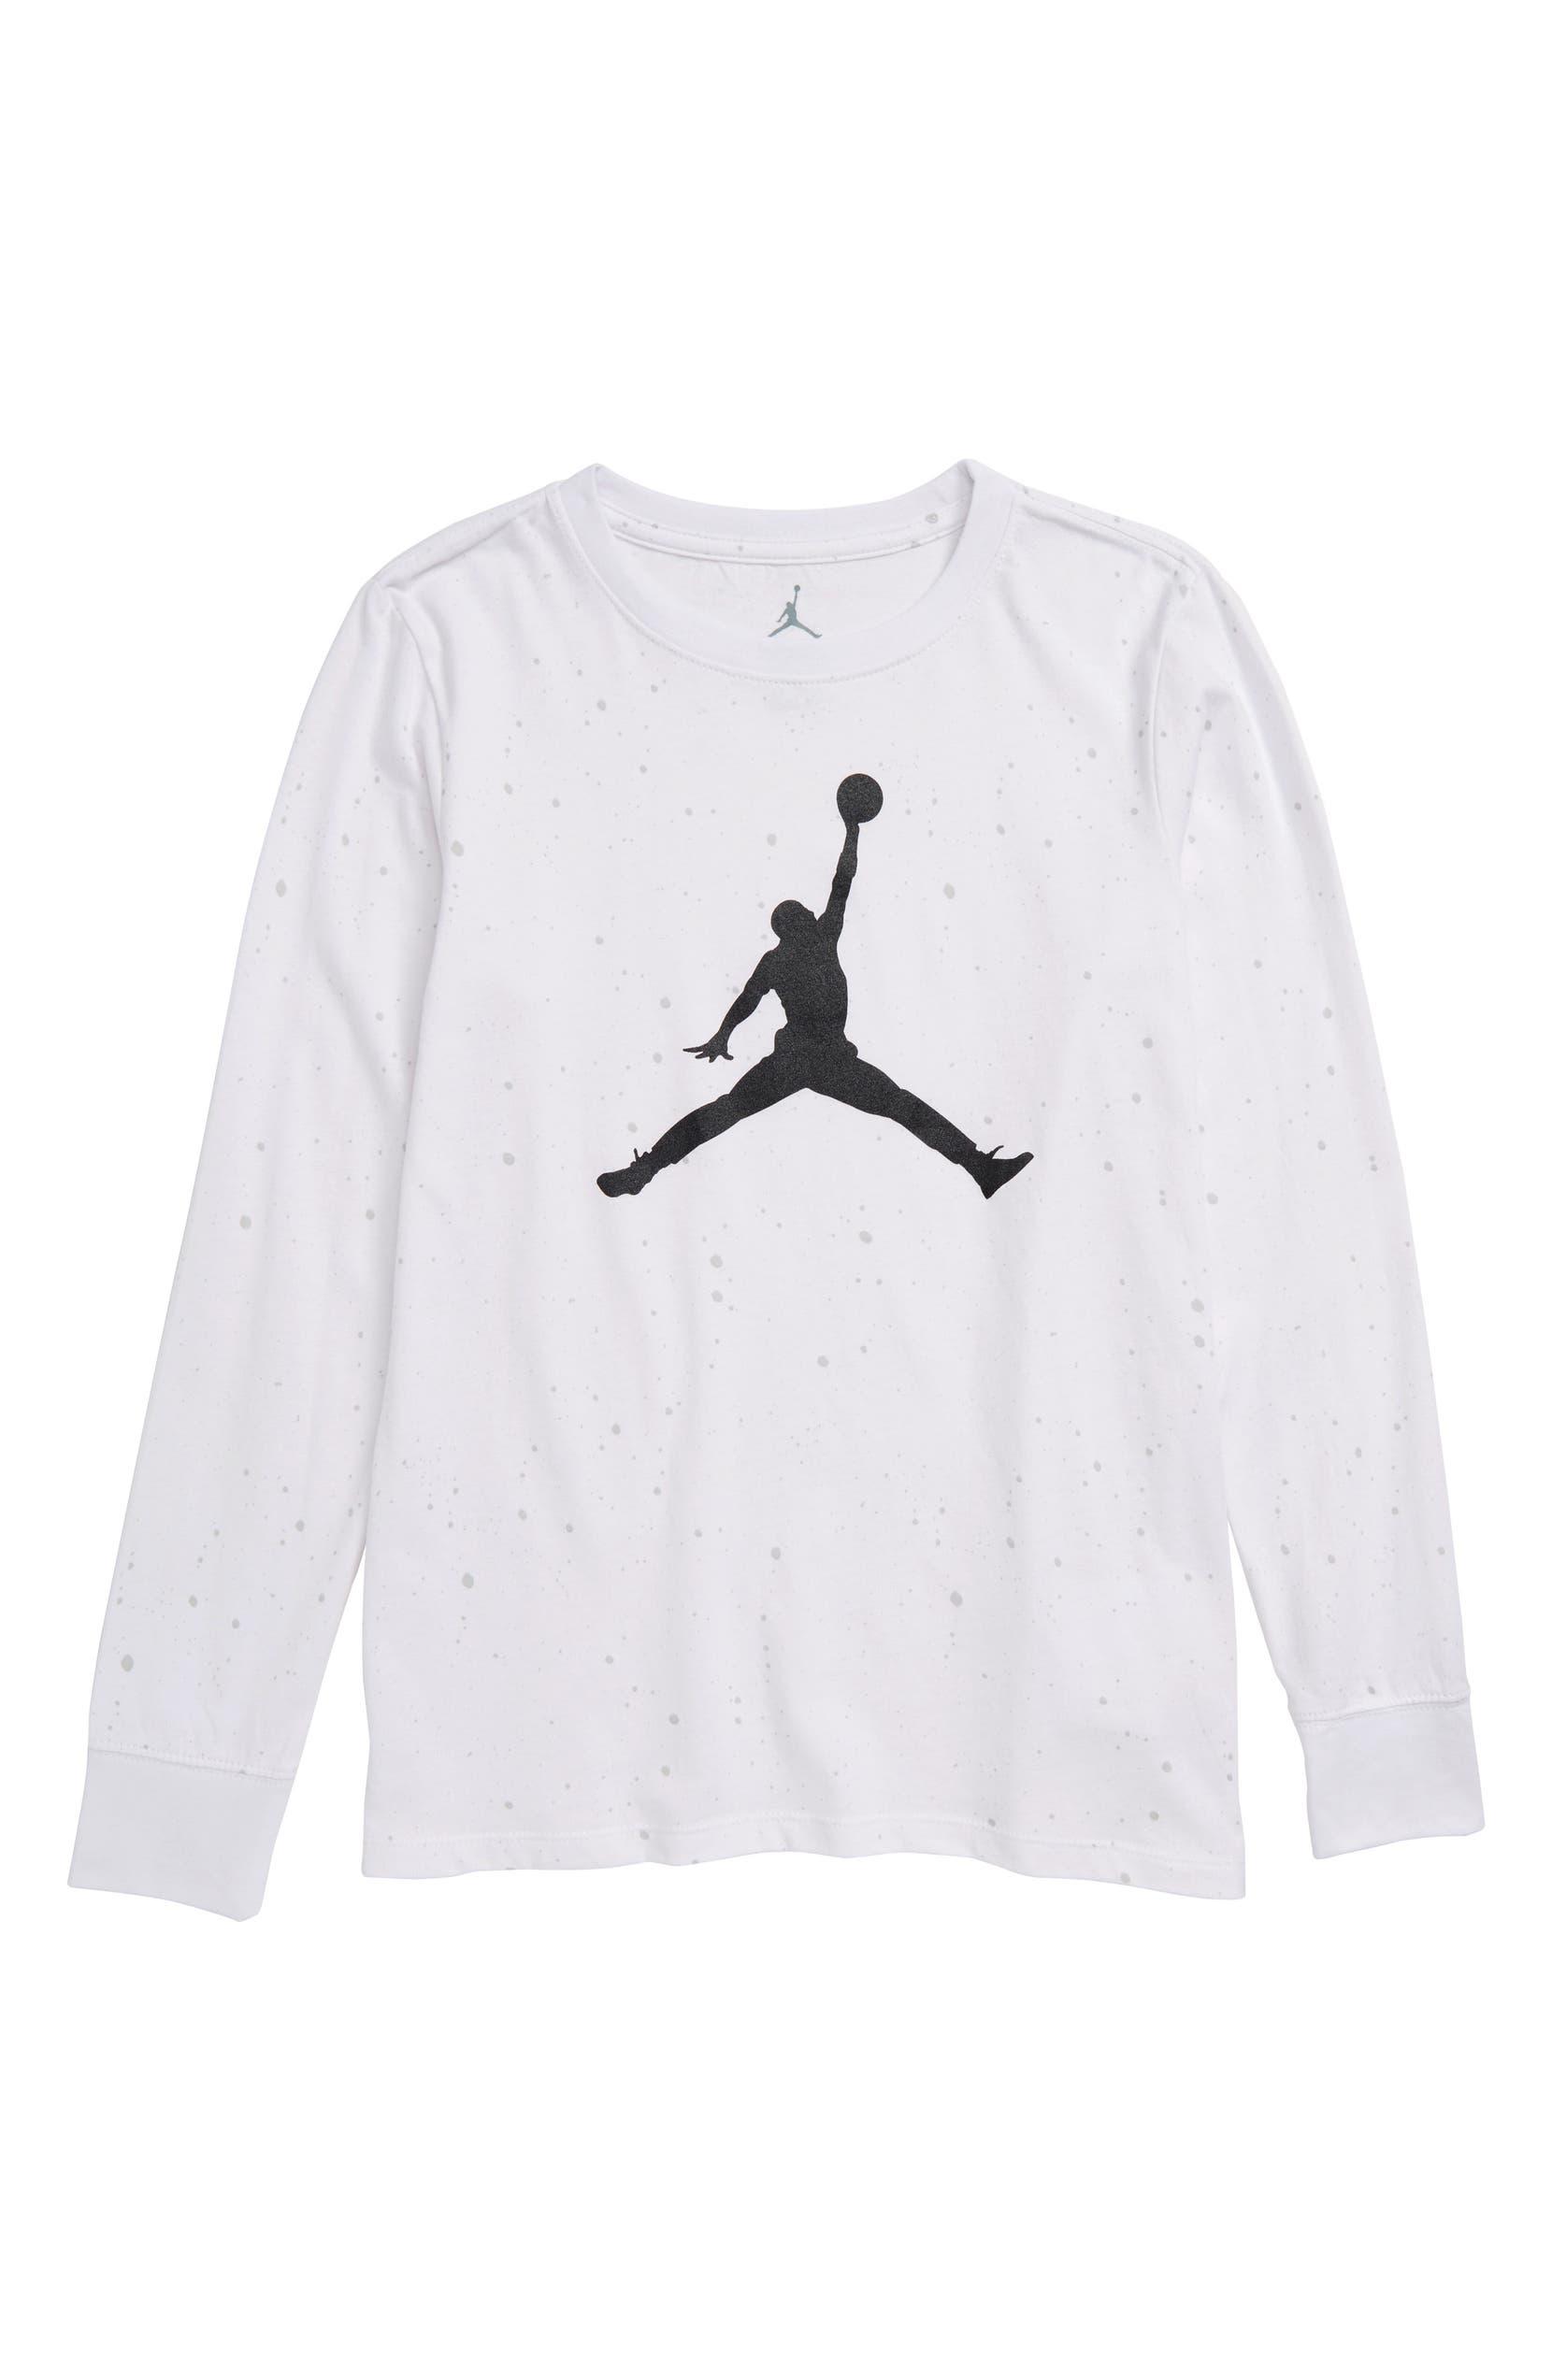 5bd9ffce51c616 Jordan Jumpman Speckle Cotton T-Shirt (Big Boys)